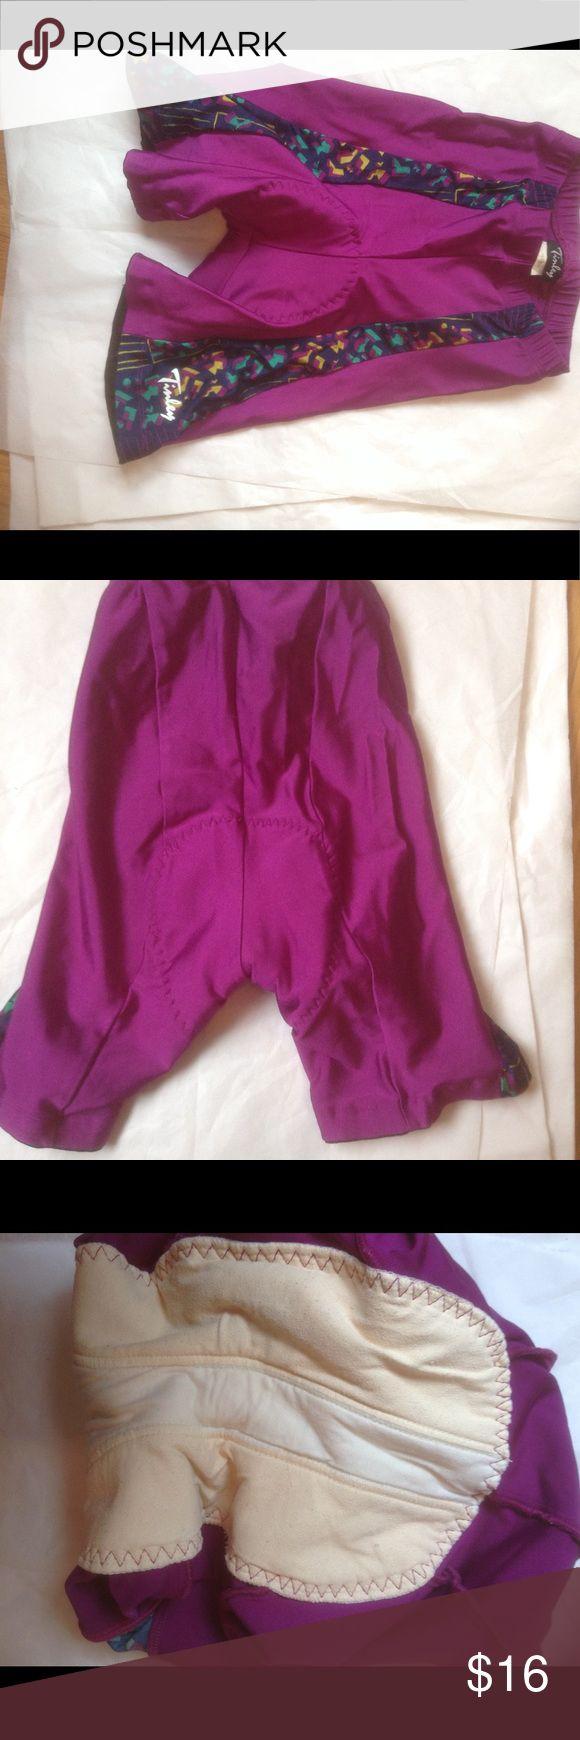 Internally medium padded cycle shorts TINLEY Nylon Spandex Padded Bike Bicycle Cycling Shorts, Purple, Women M tinley Shorts